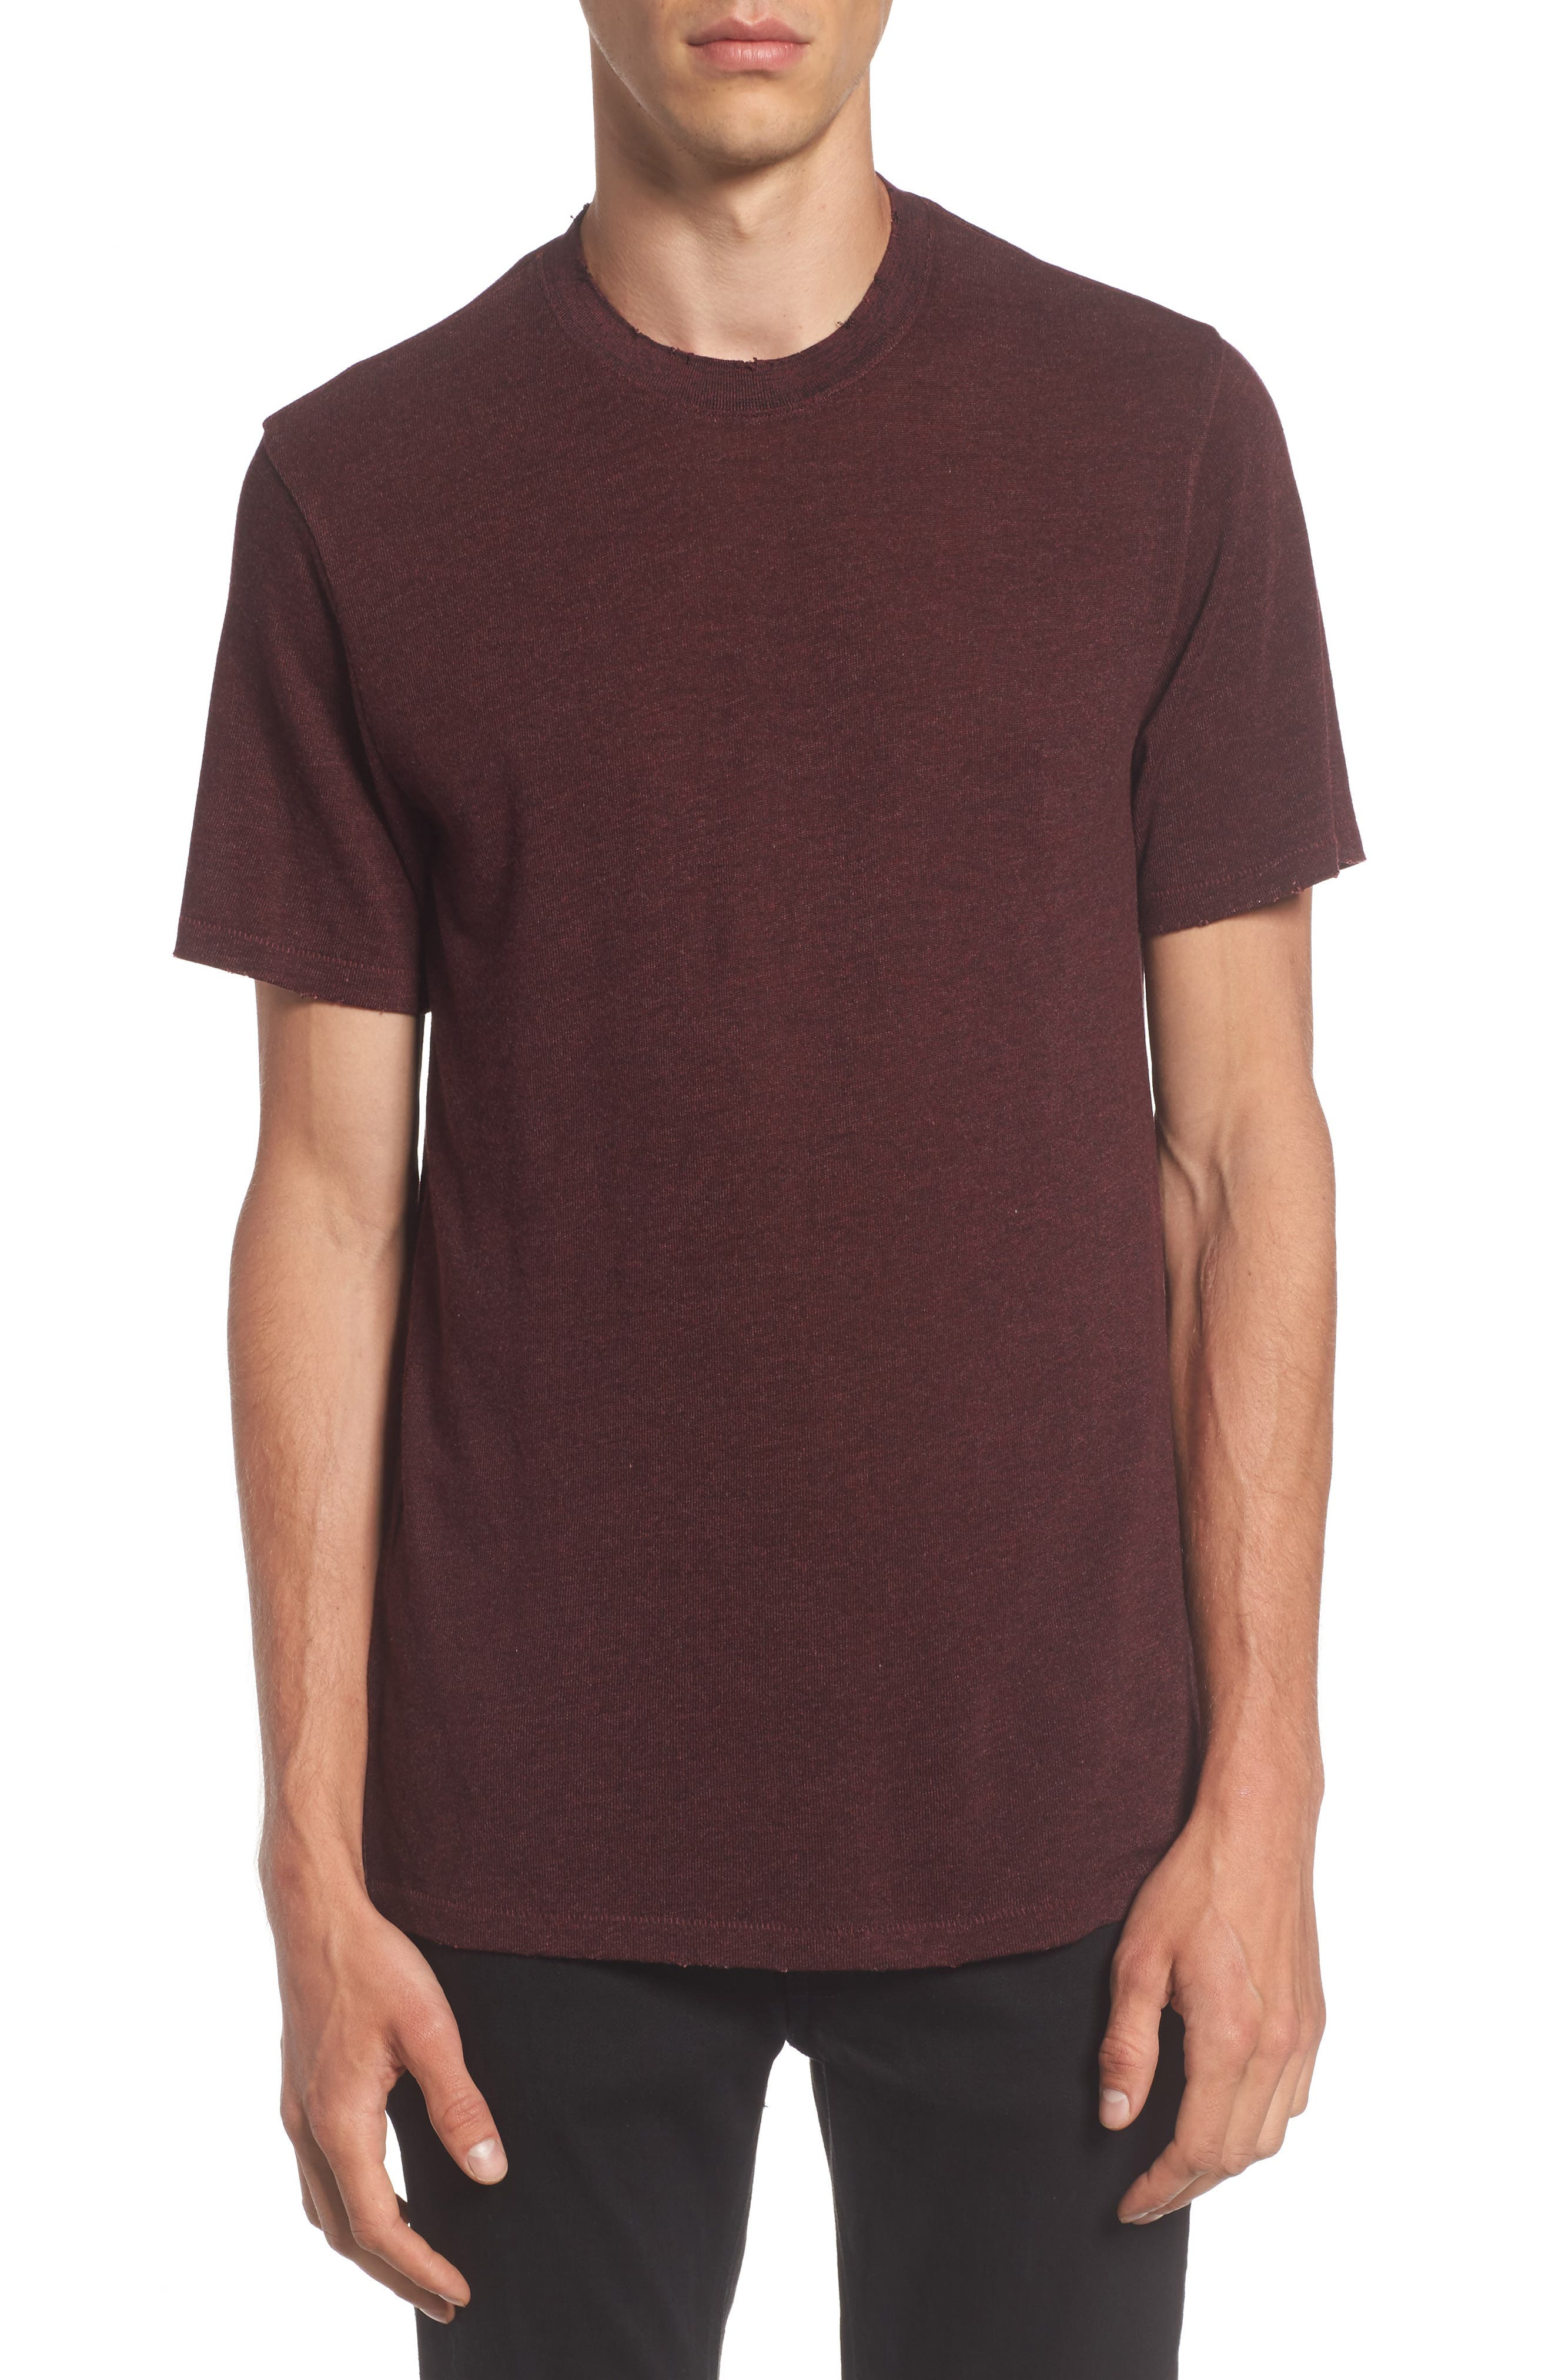 TREASURE & BOND Core Crewneck T-Shirt